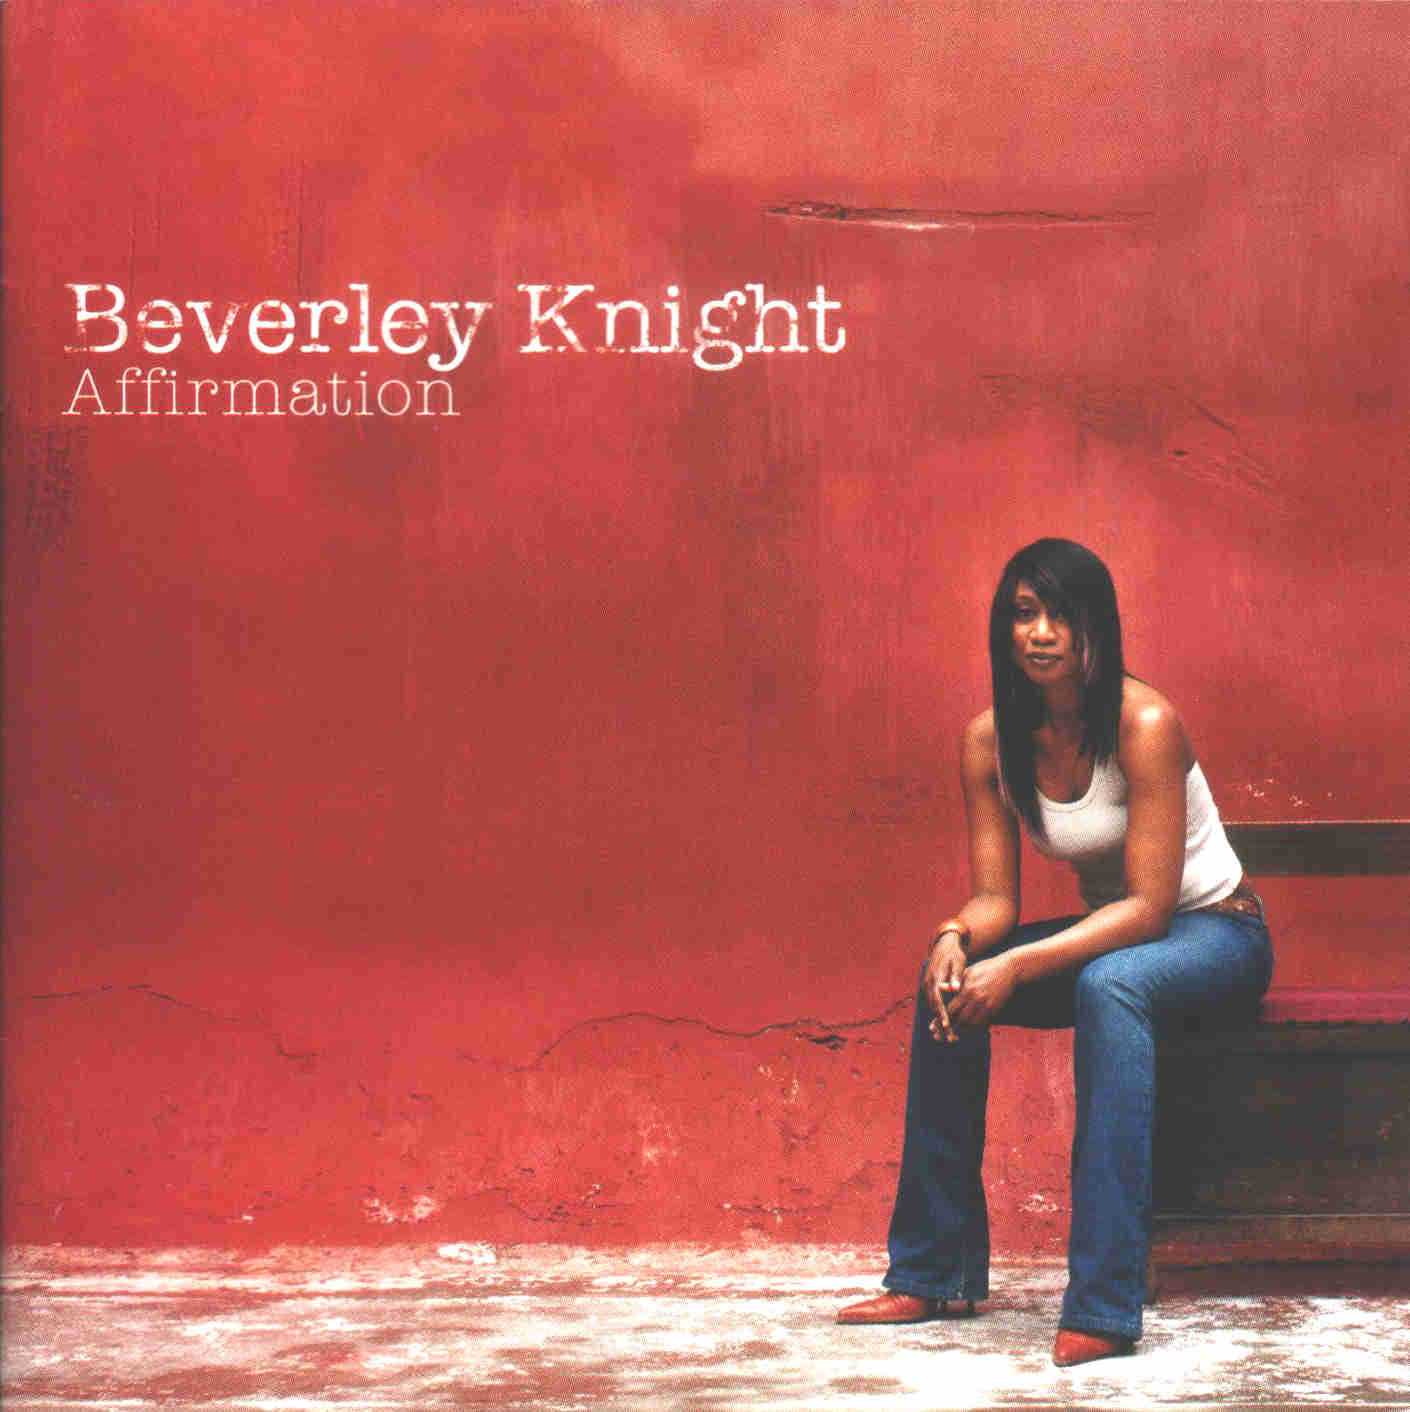 1169371037_beverley_knight__affirmation_front.jpg